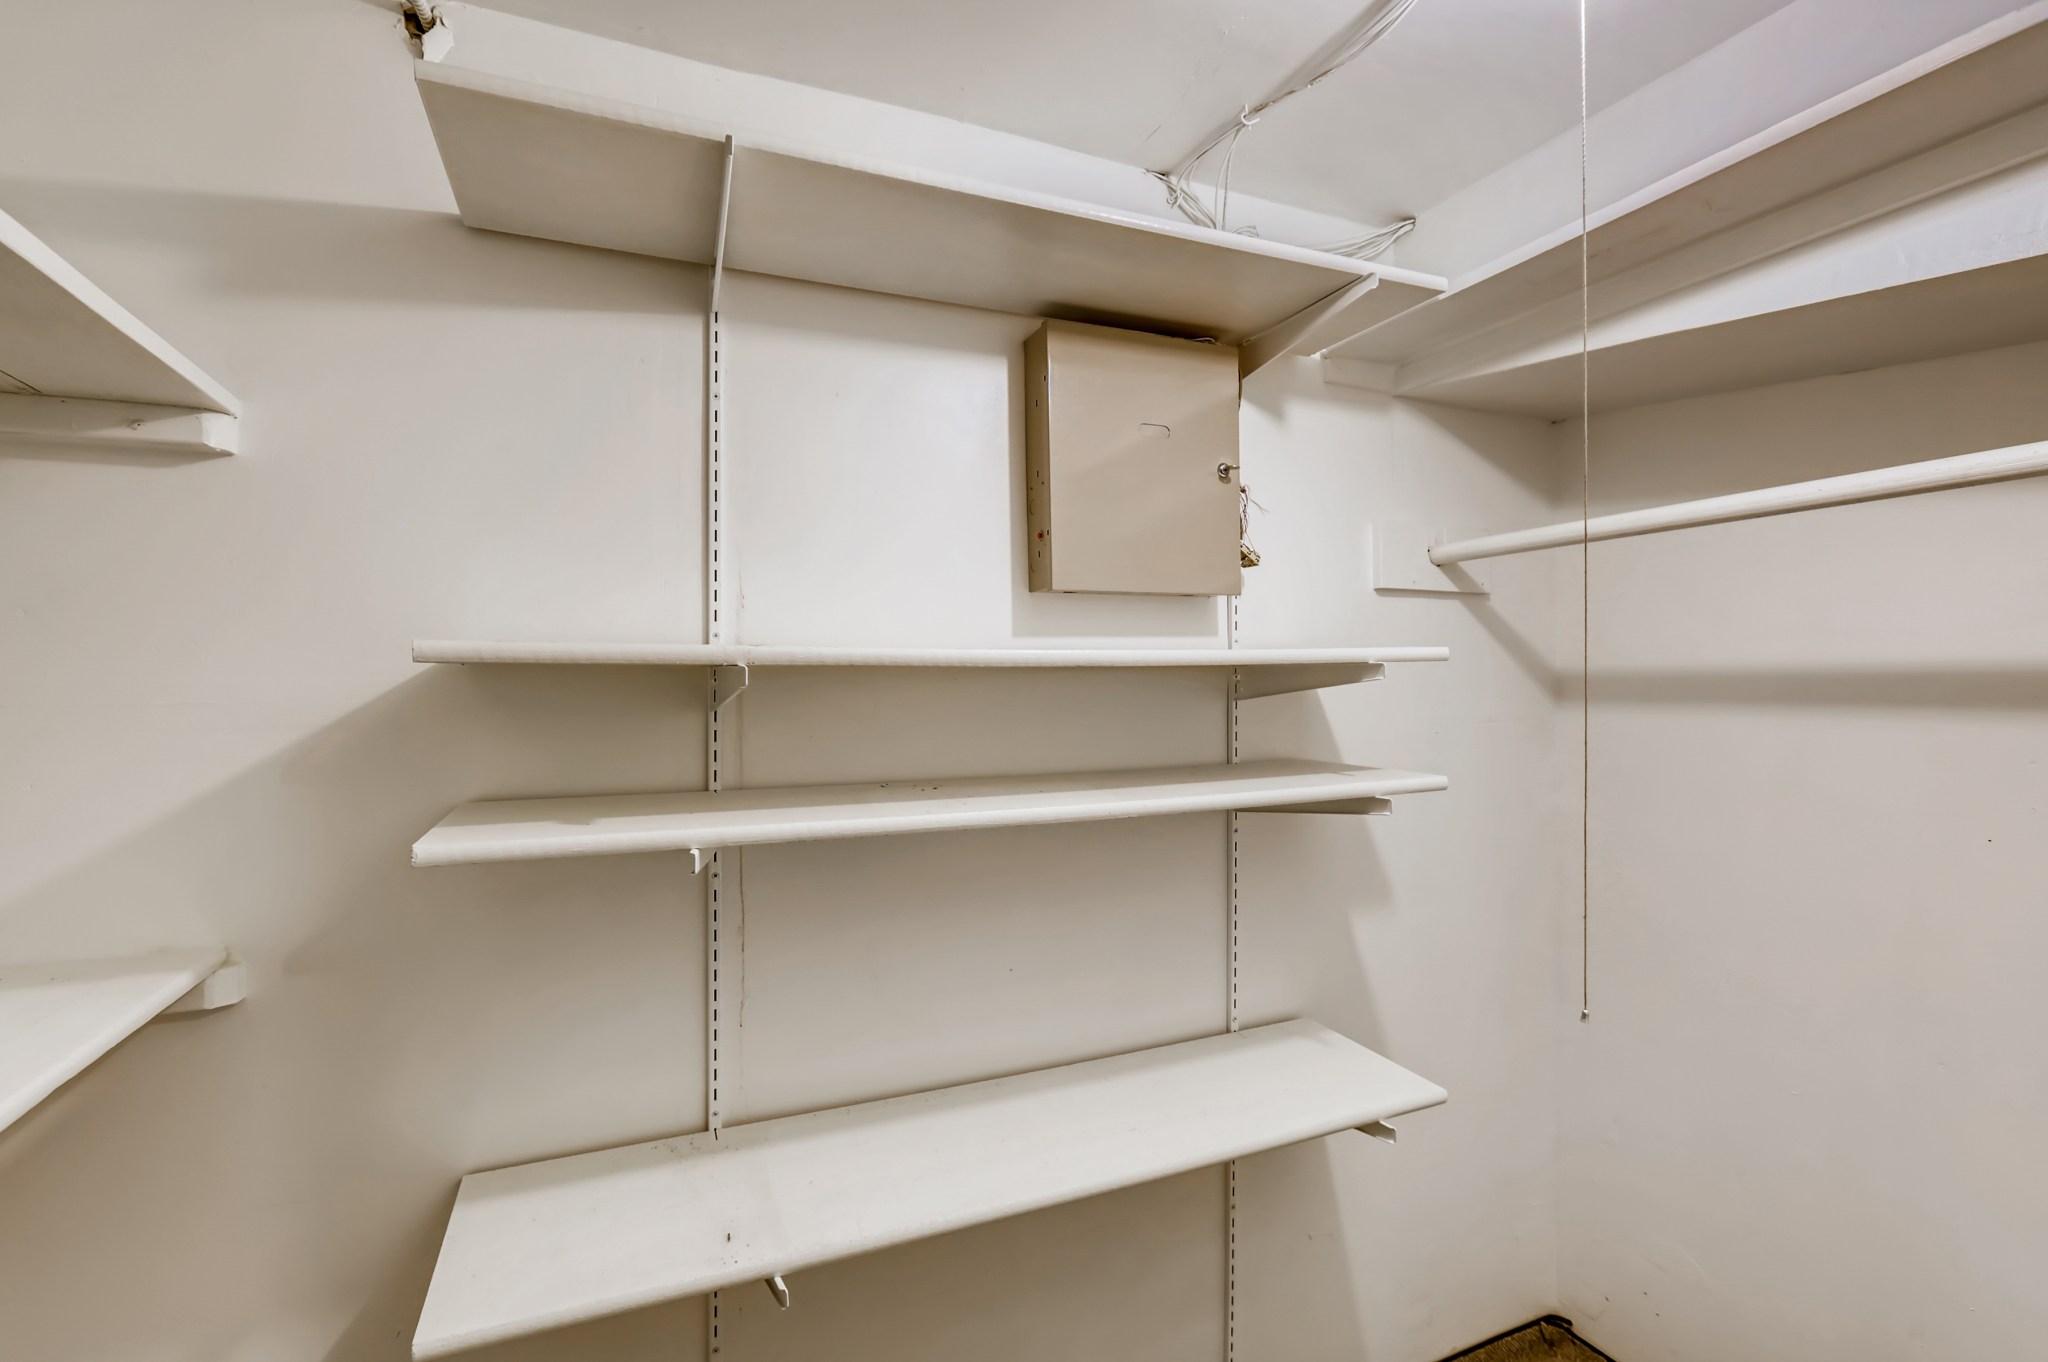 39-Lower-Level-Closet